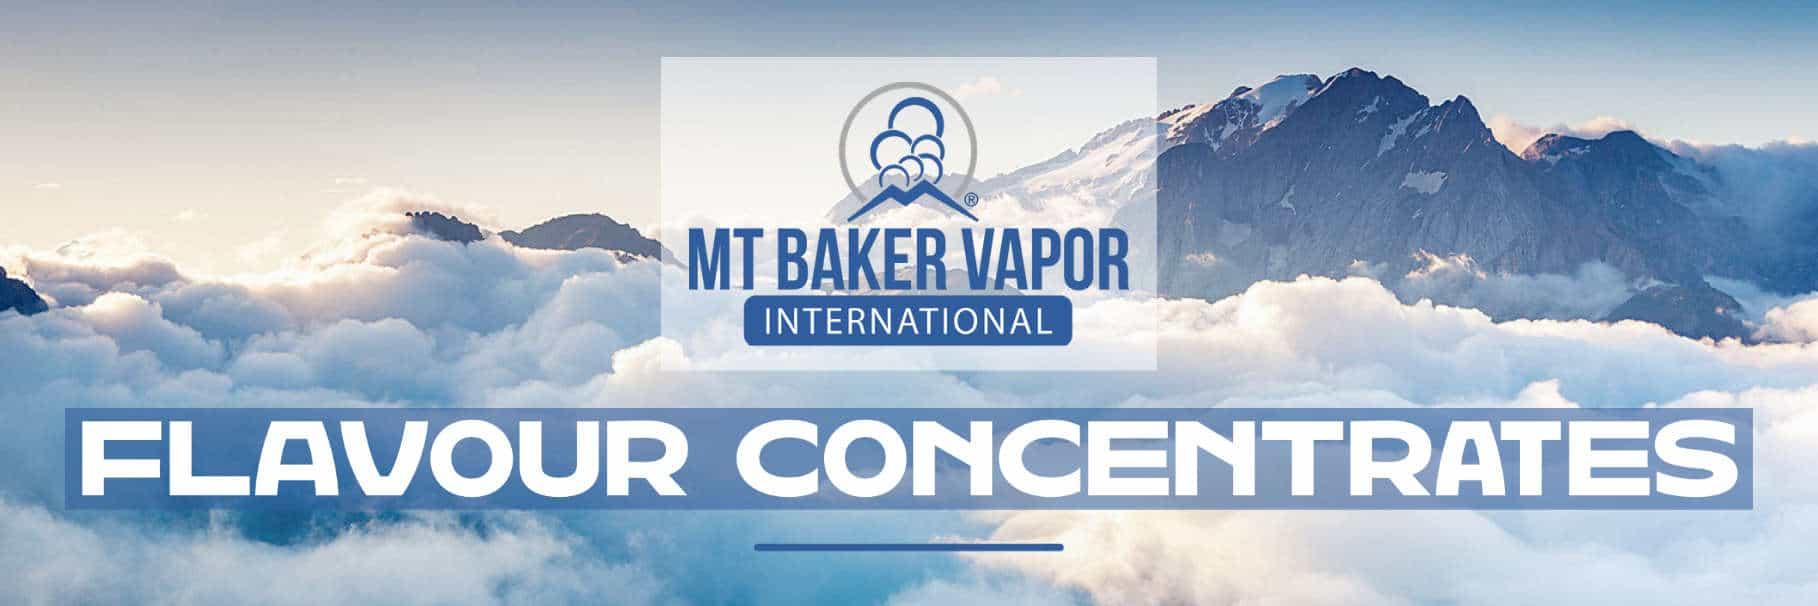 MBV Flavour Concentrates Banner